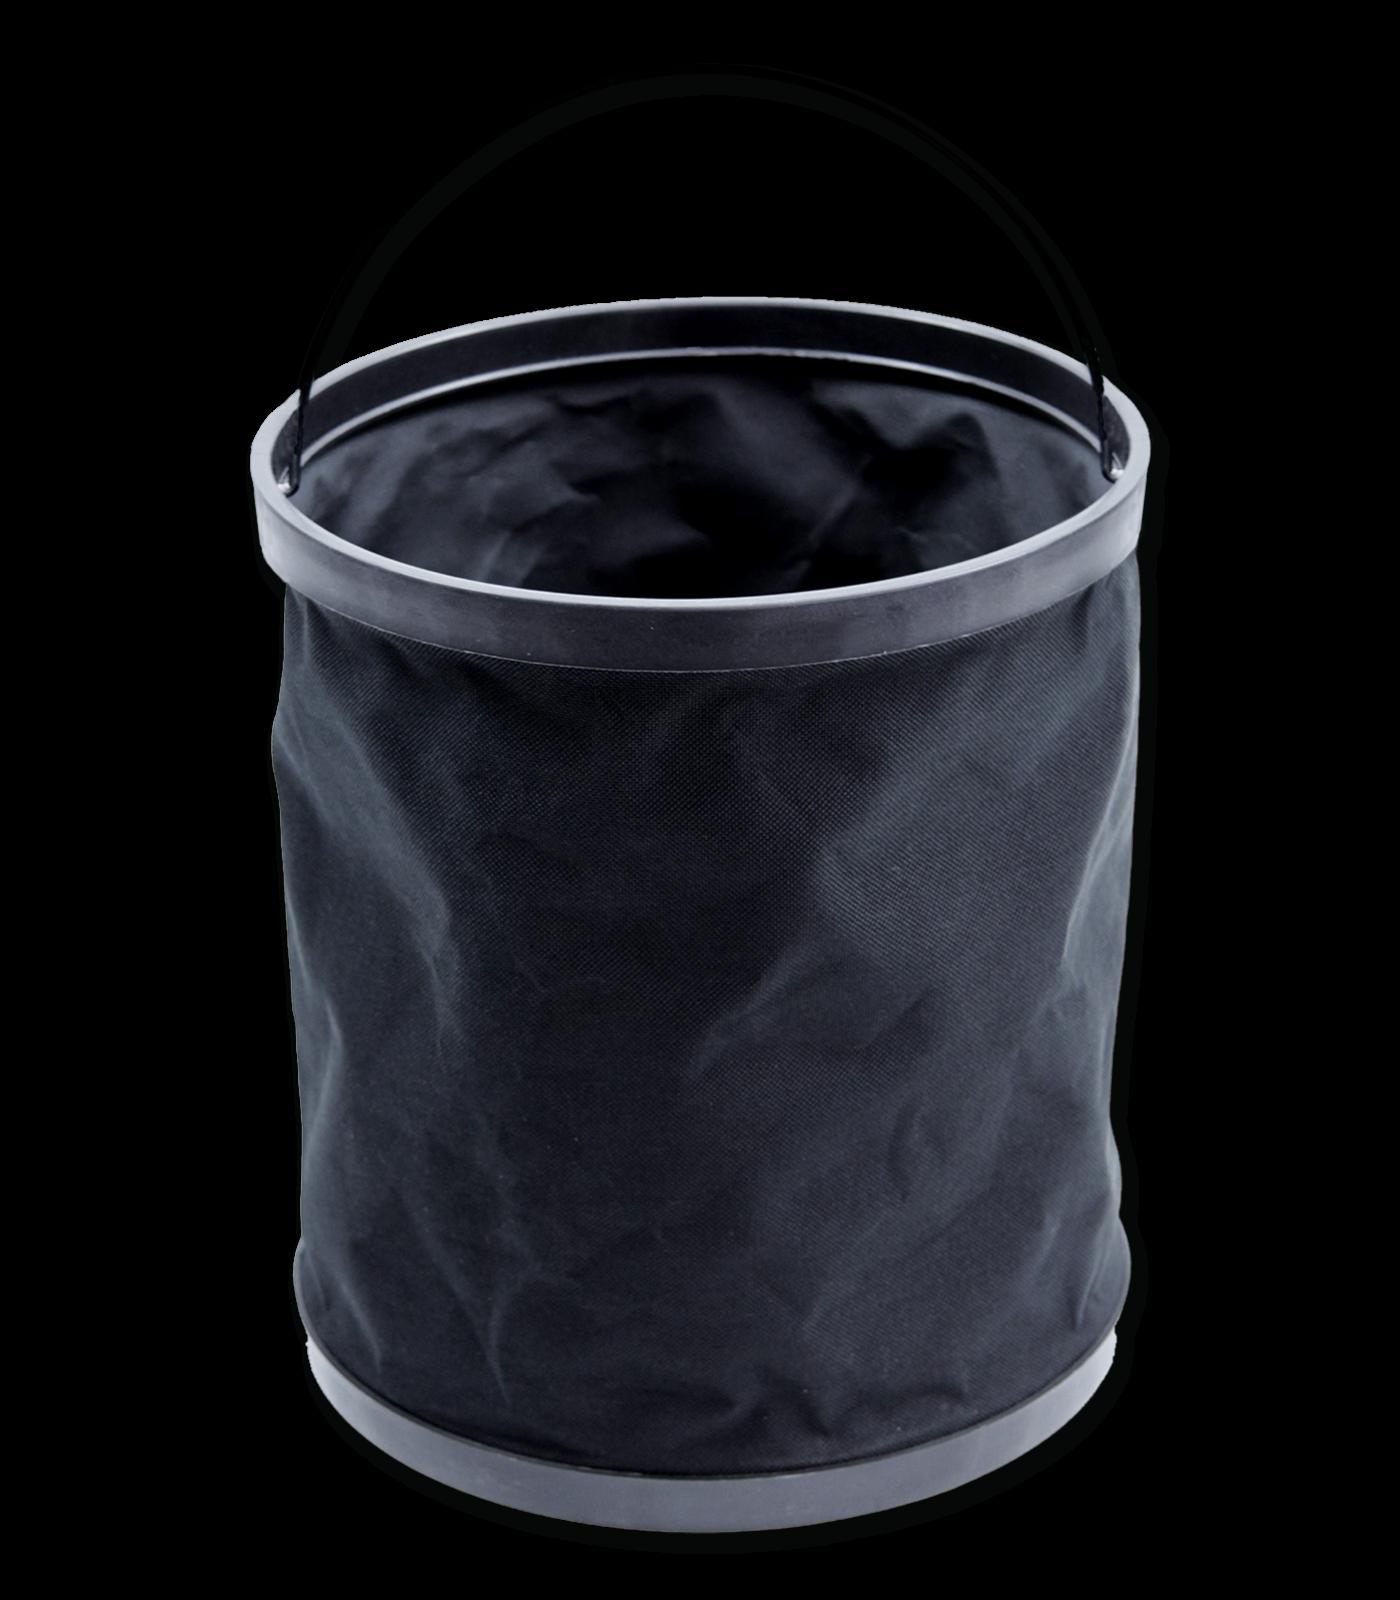 Falteimer schwarz